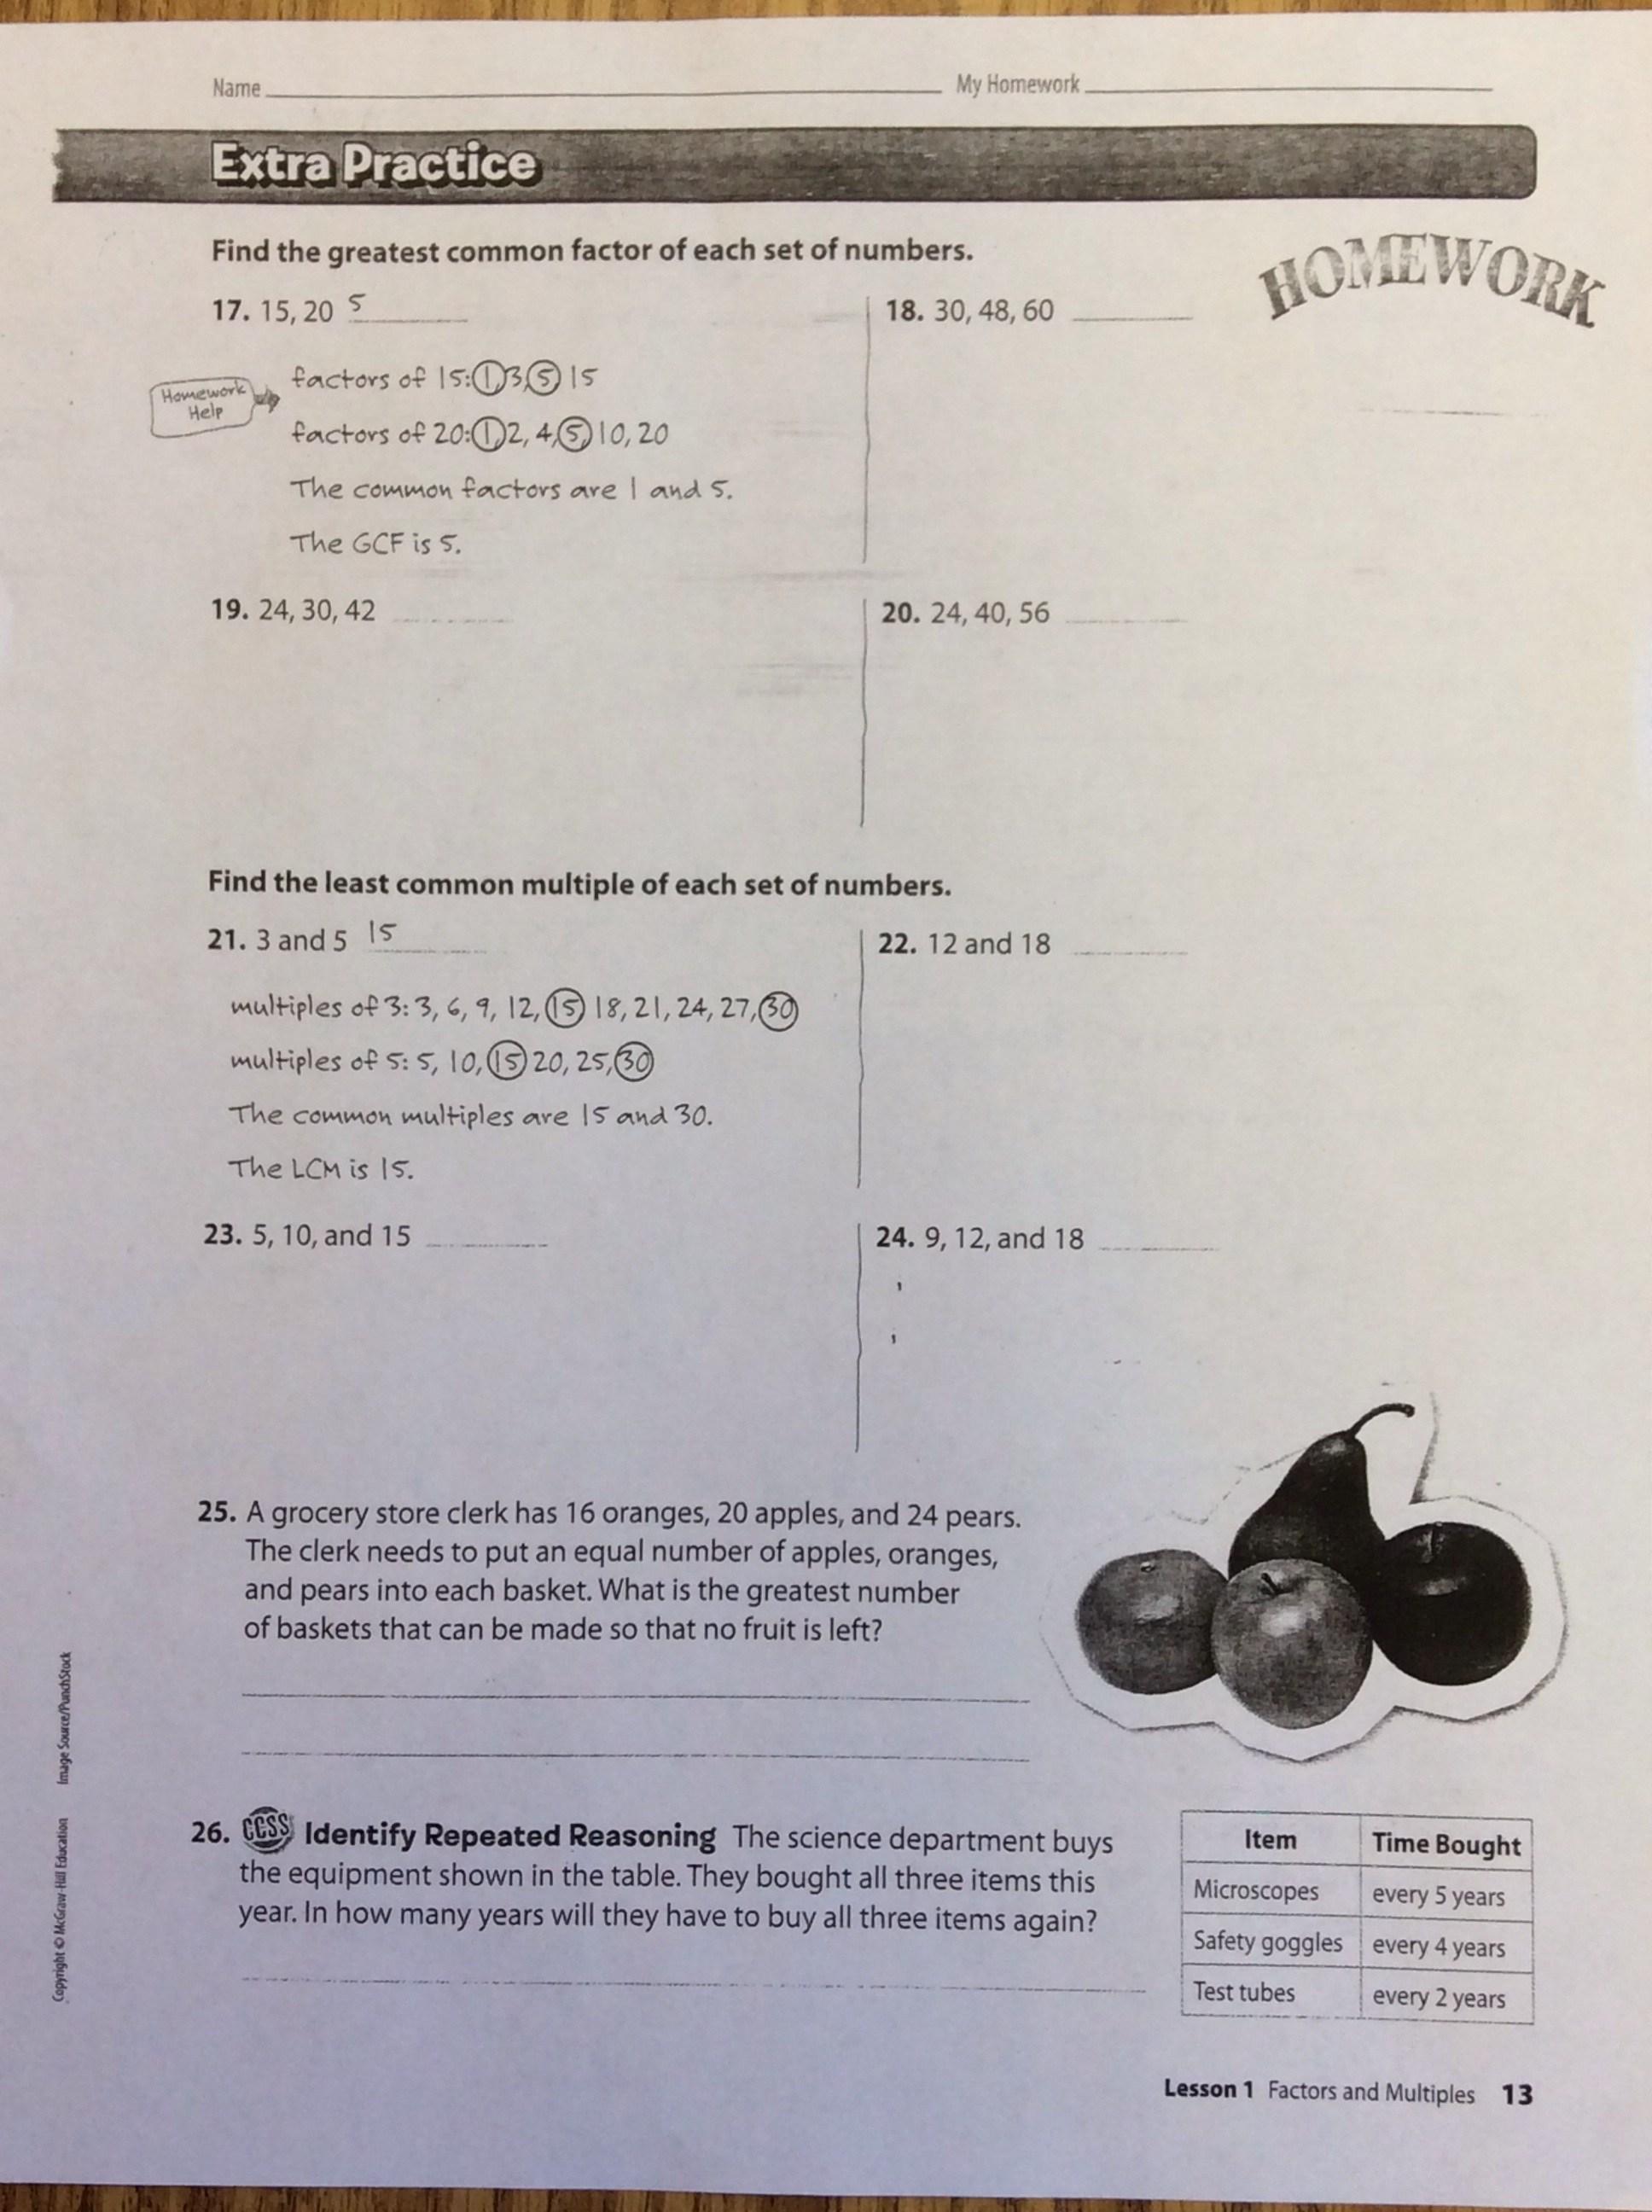 writing a summary essay basics pdf